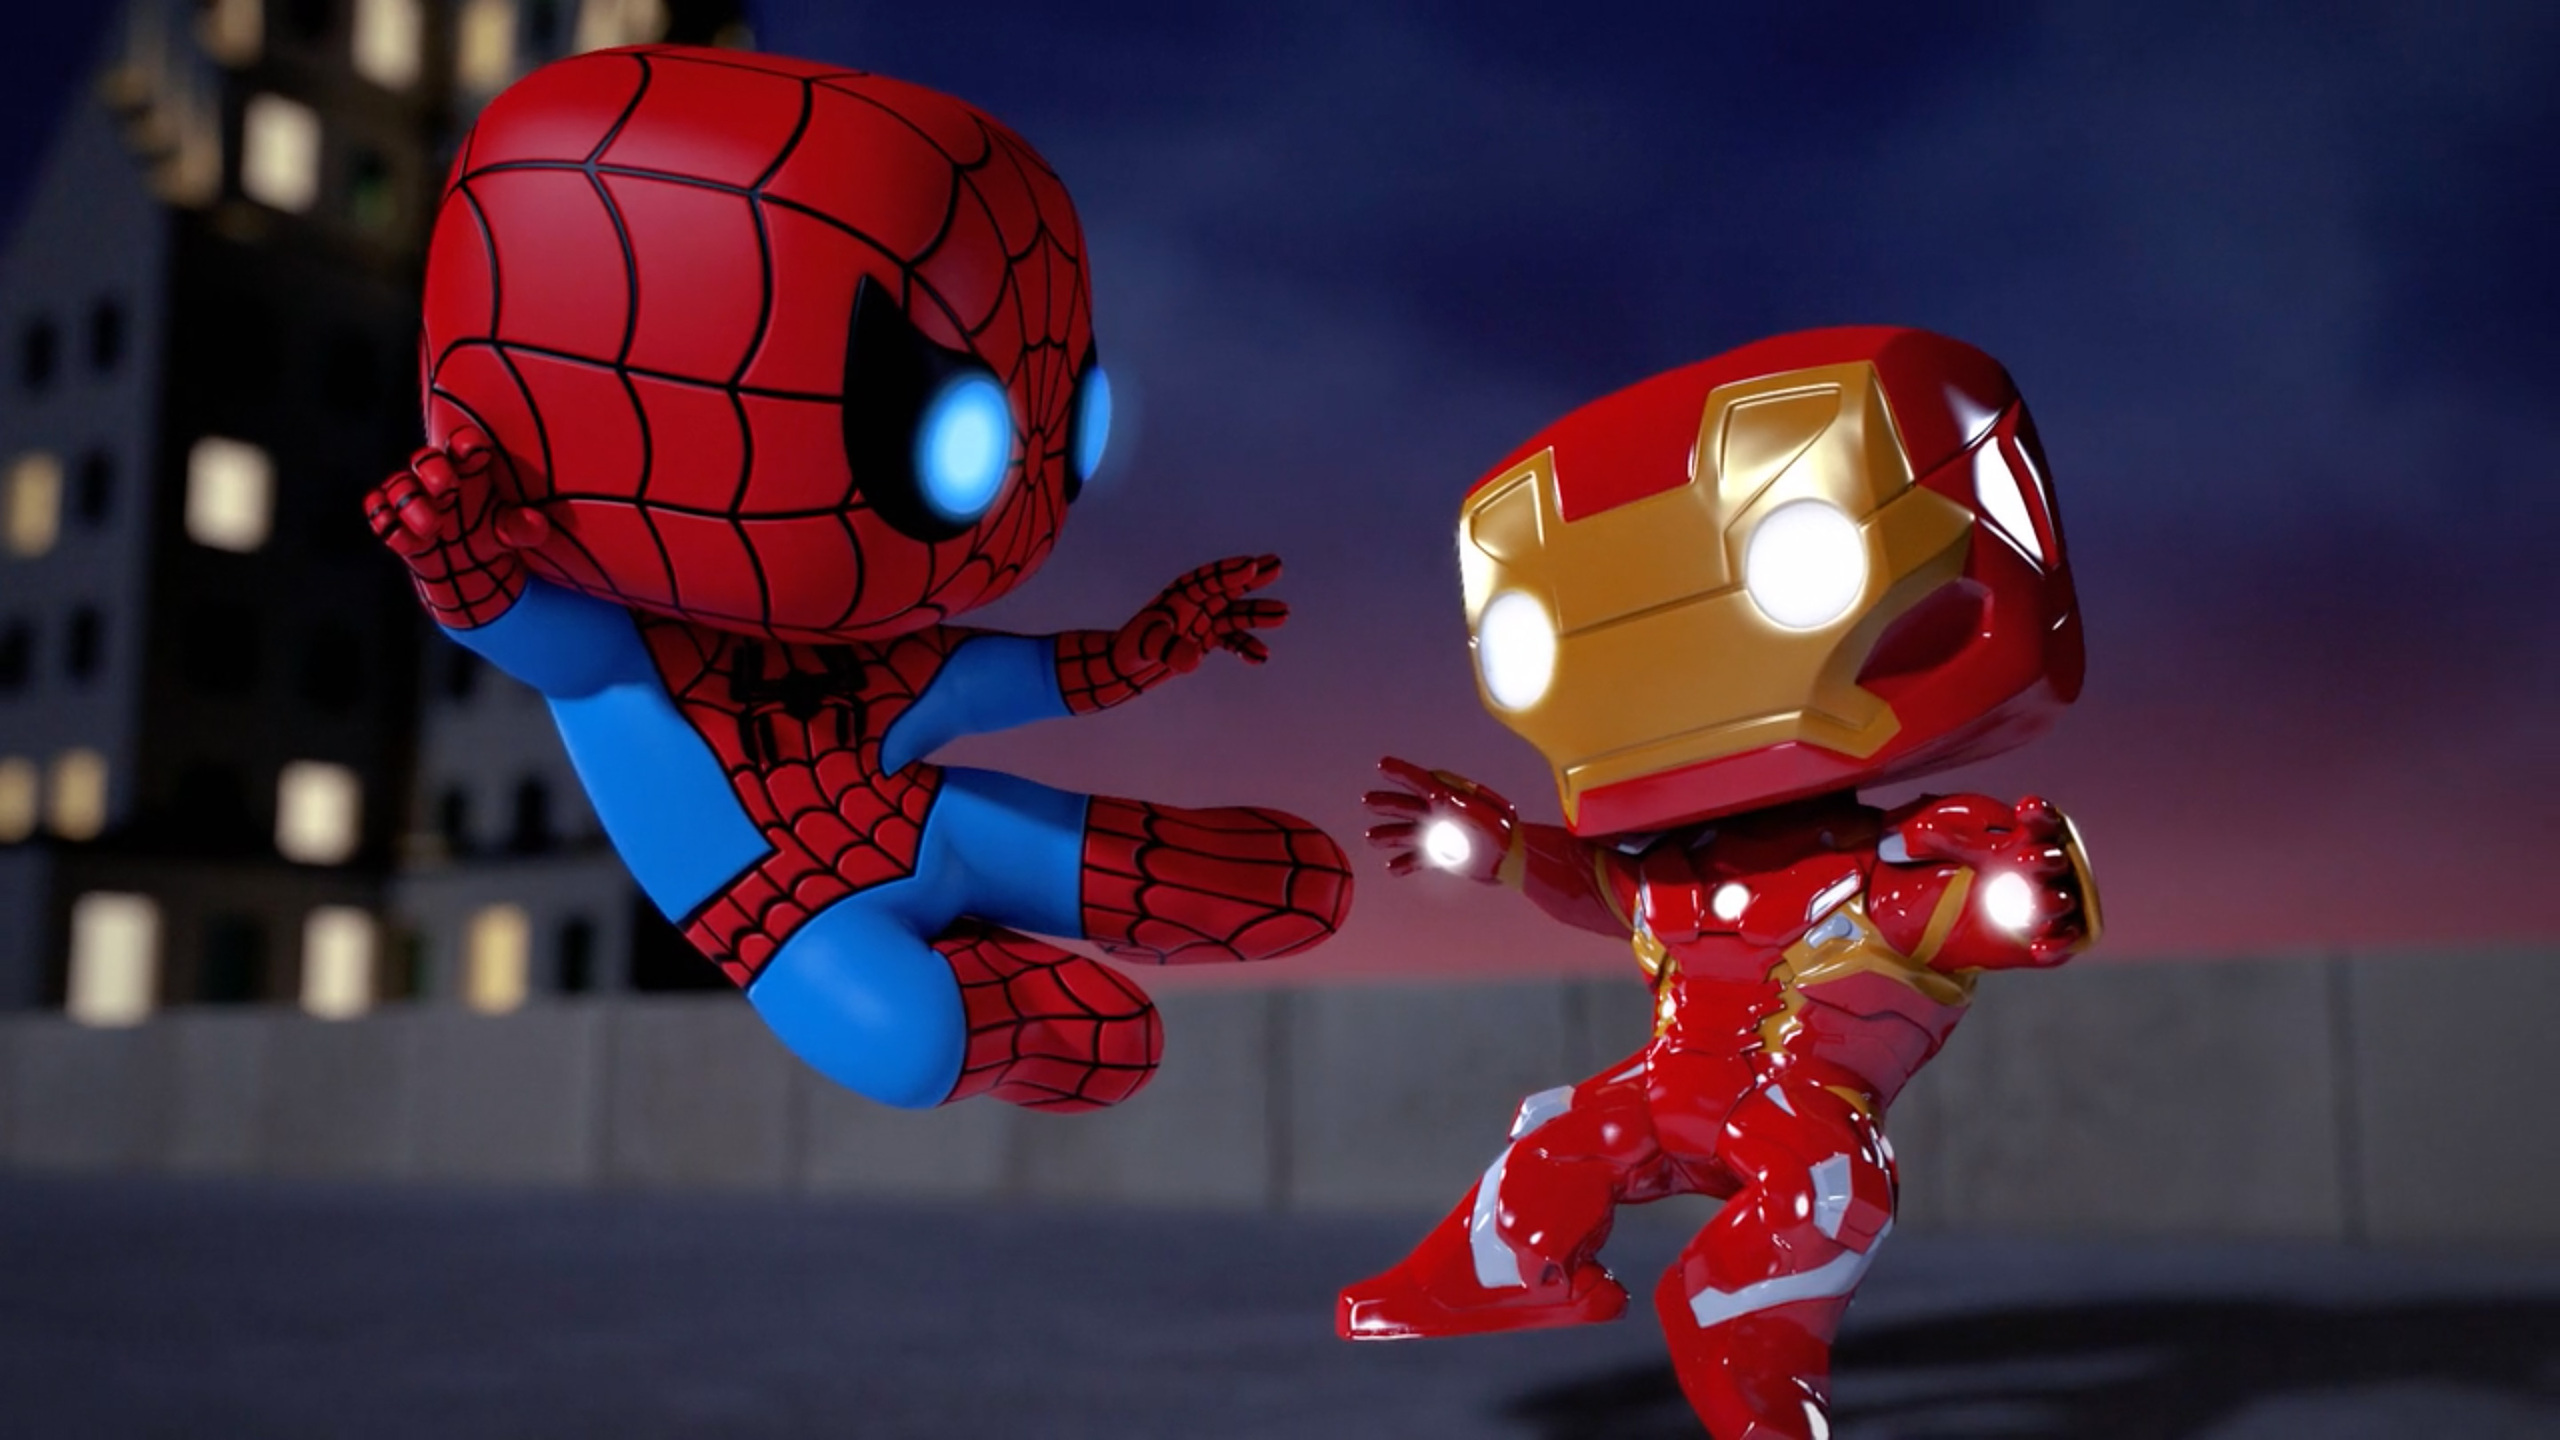 2560x1440 iron man vs spiderman spellbound animated movie - Iron man cartoon download ...